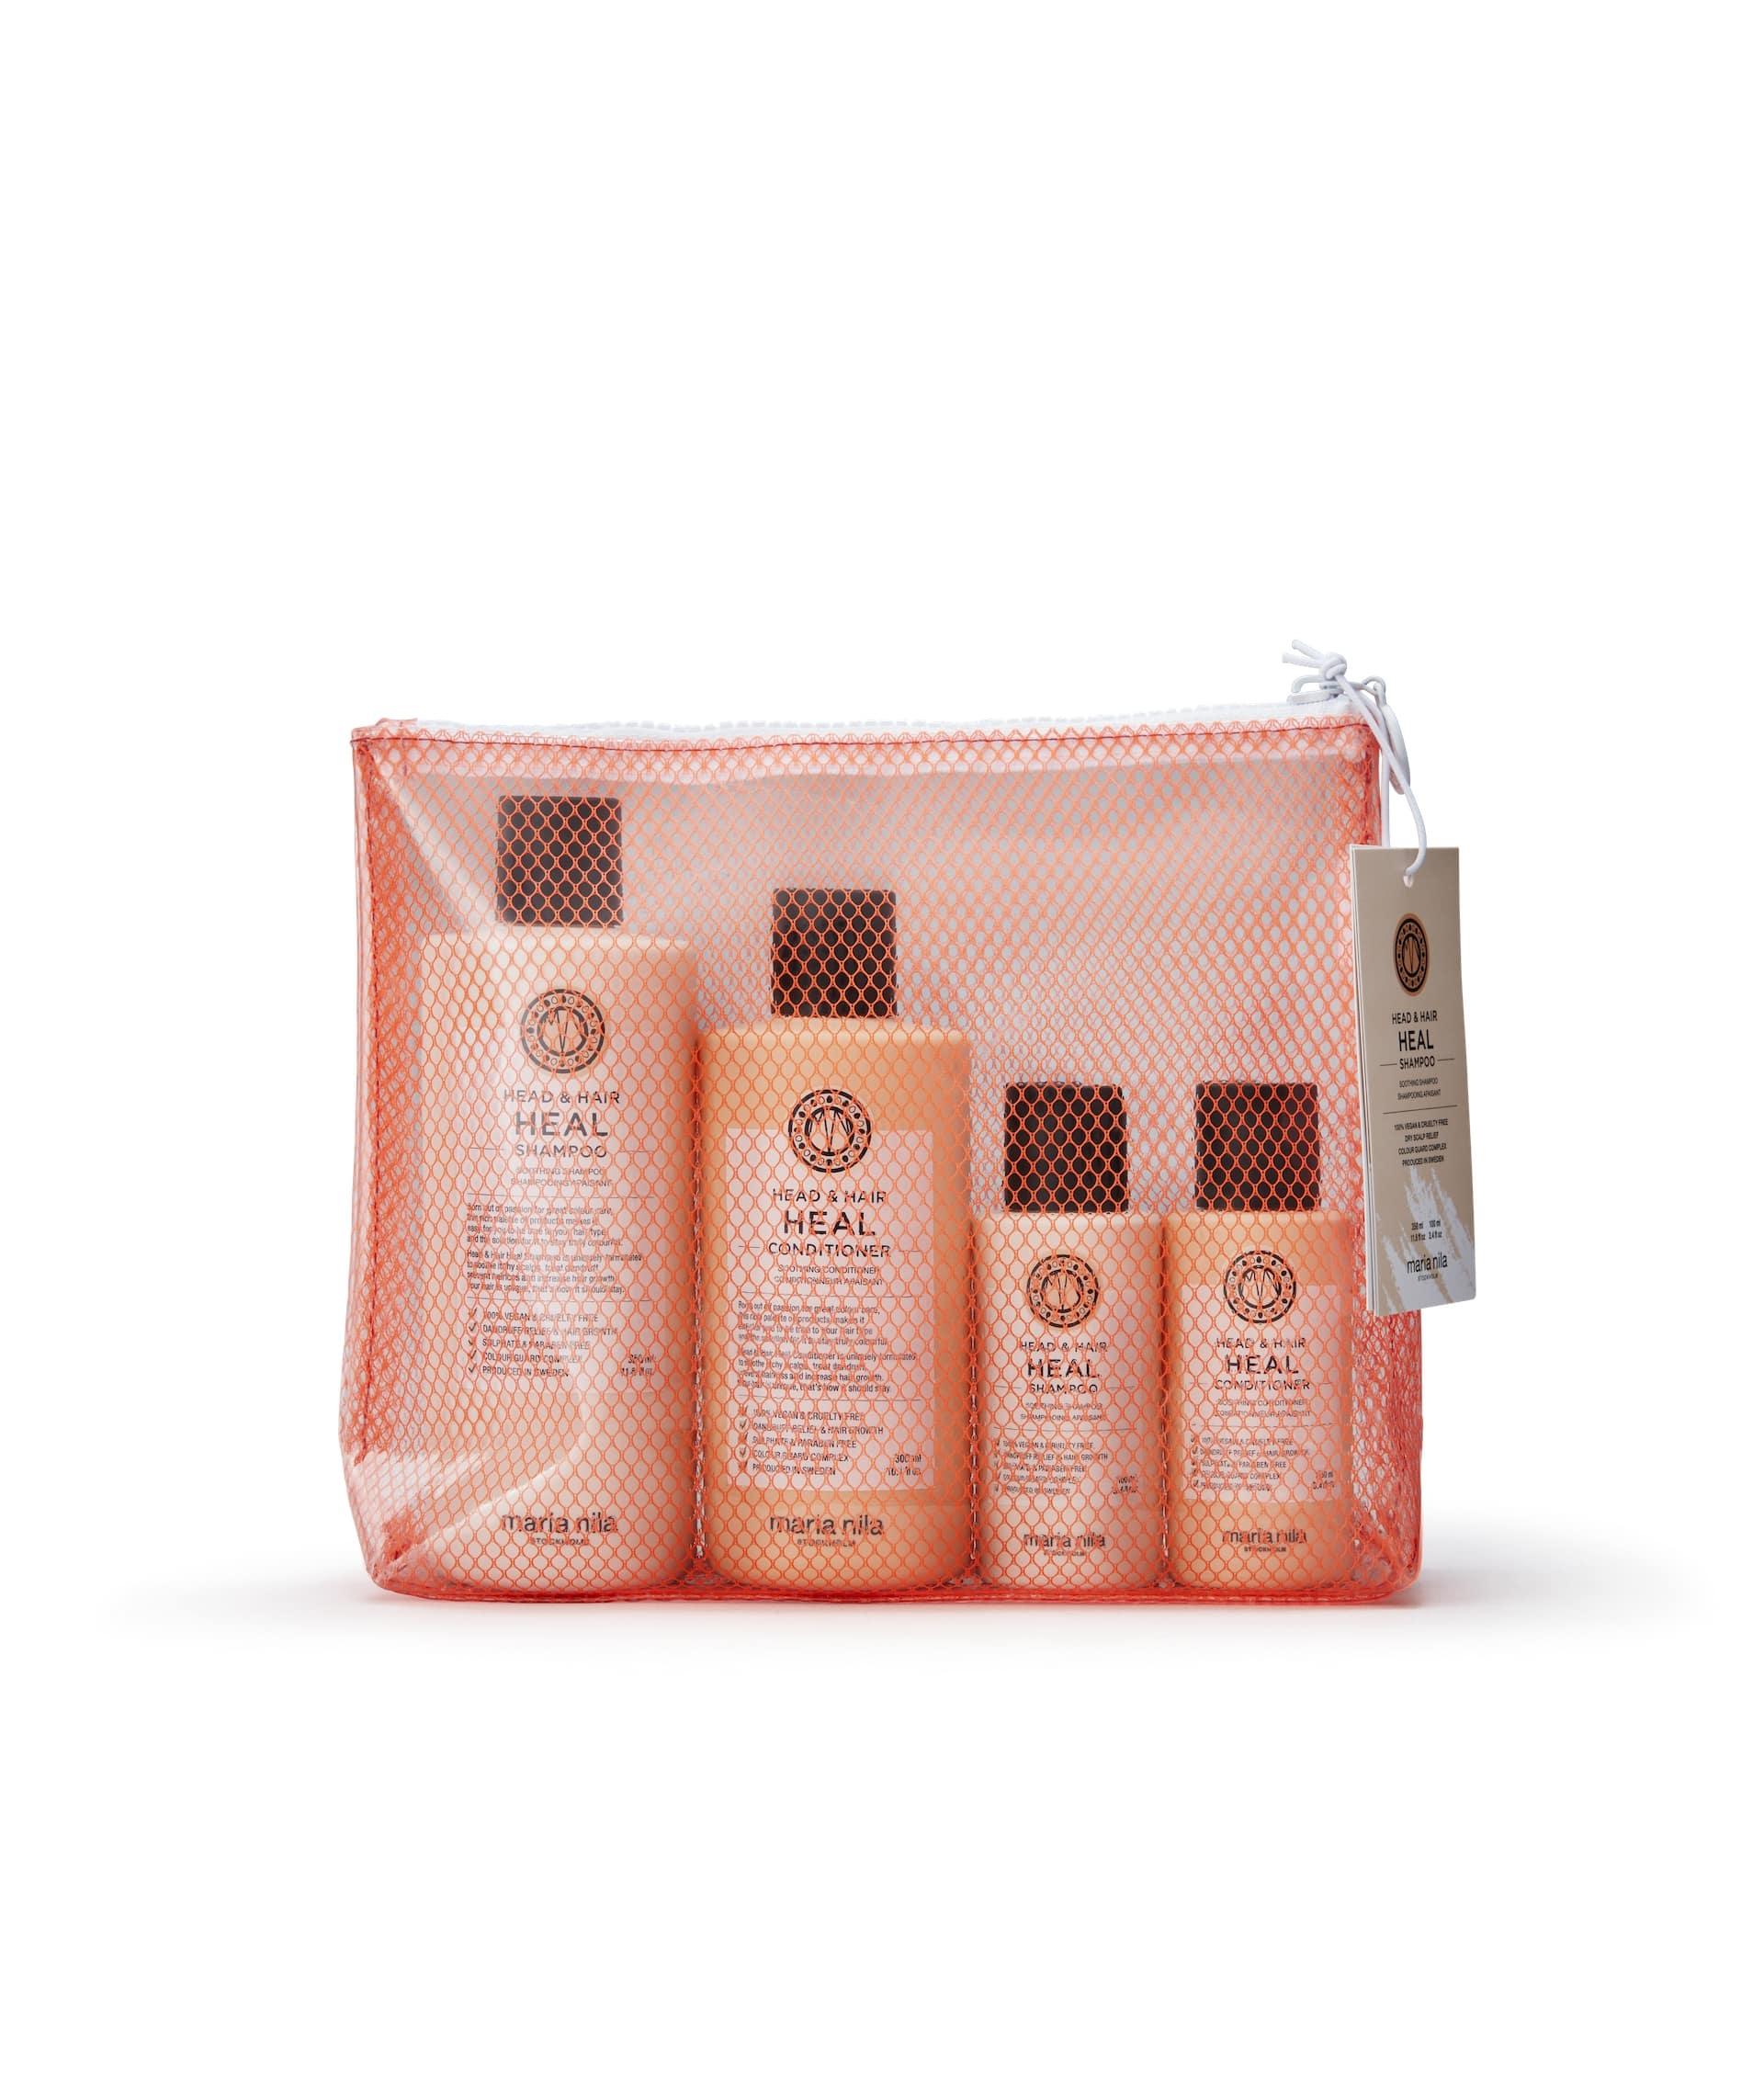 Maria Nila Heal Beauty Bag